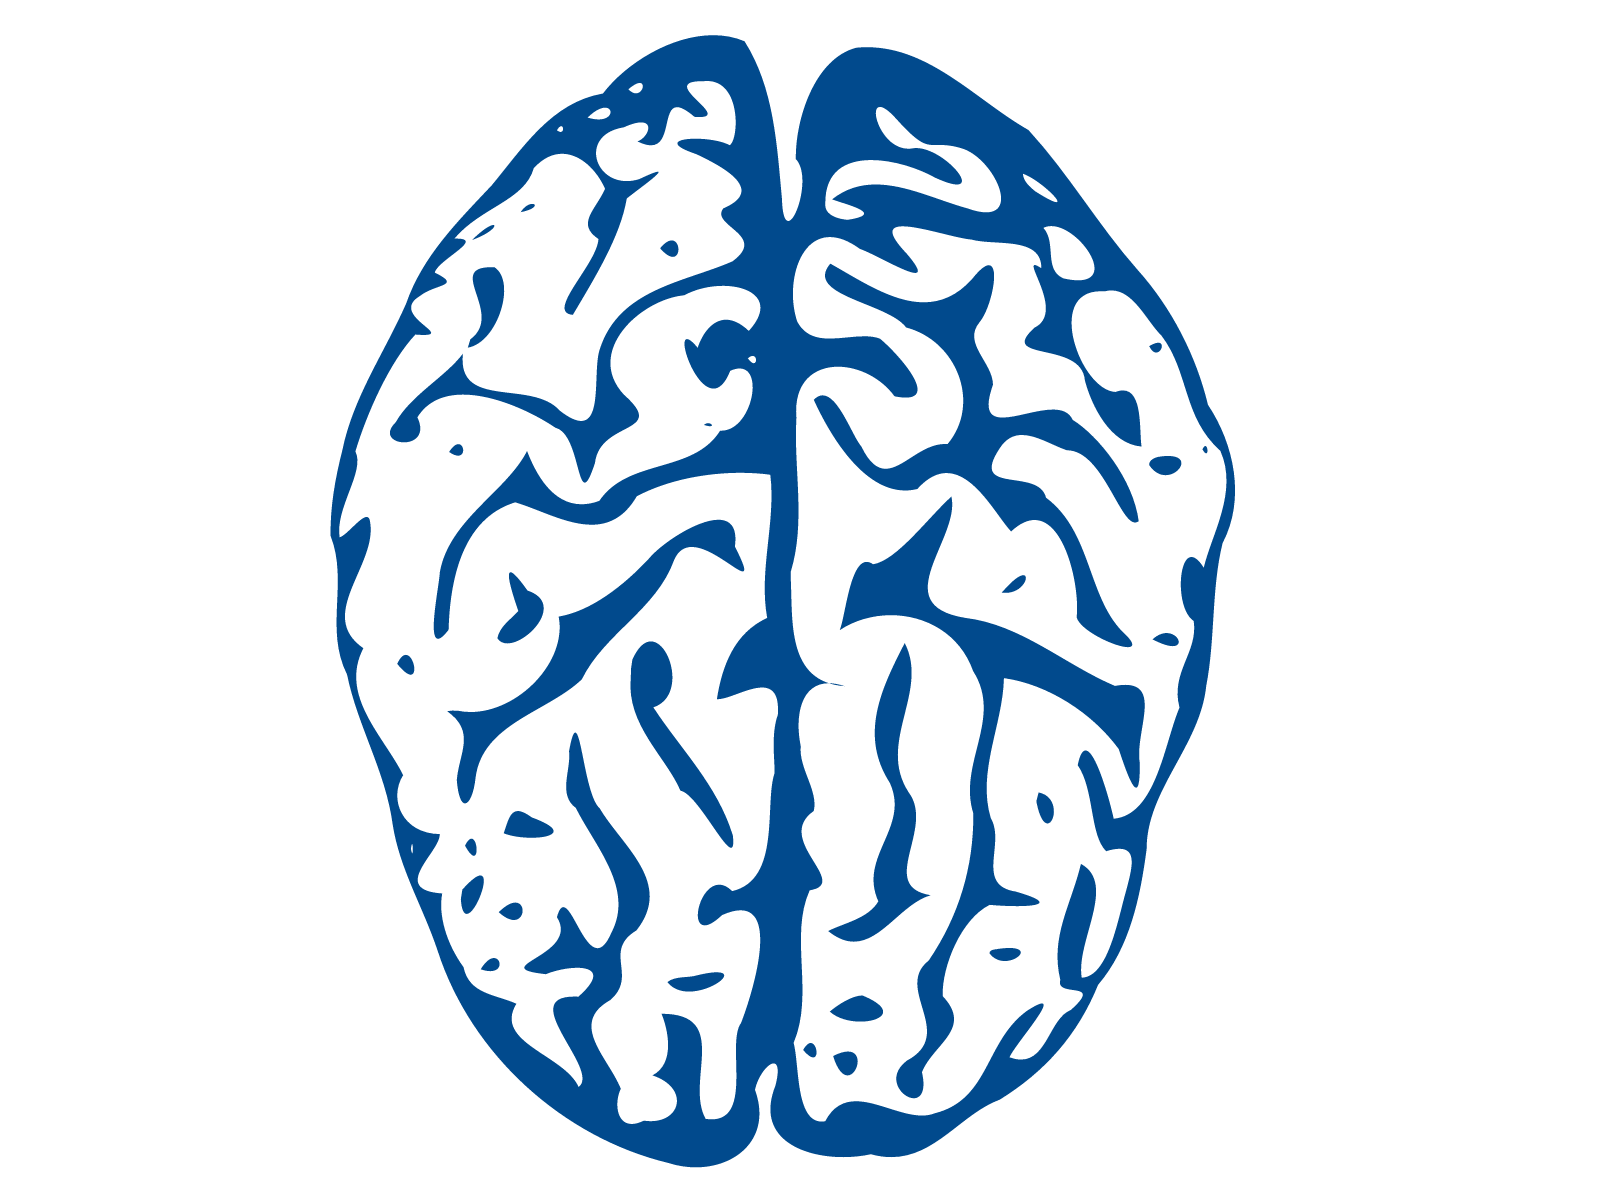 animated brain clipart - photo #29